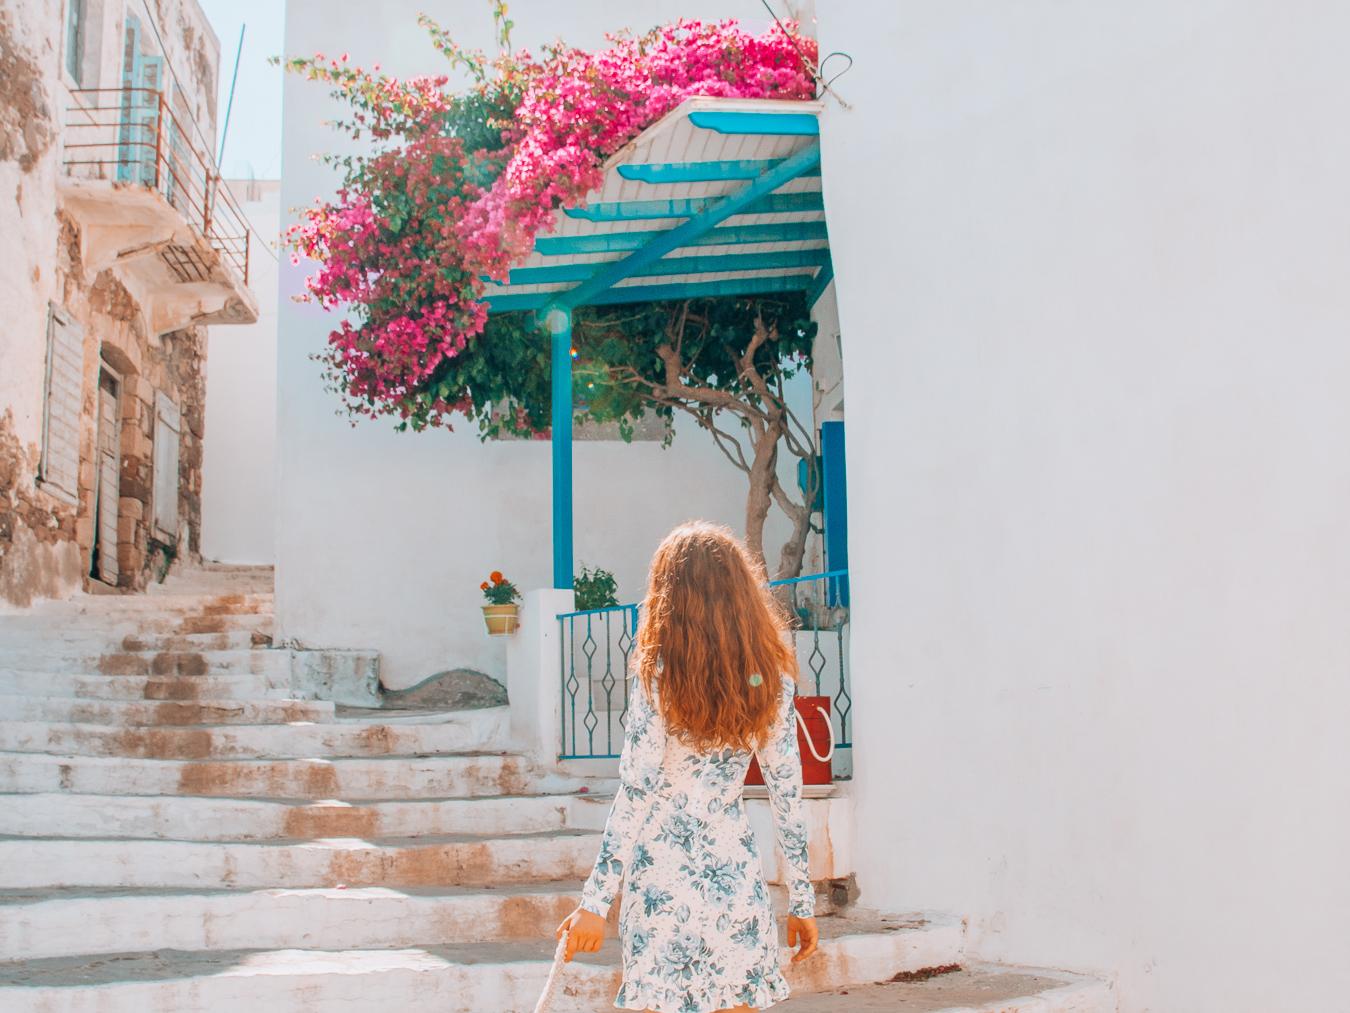 Stairs in Milos